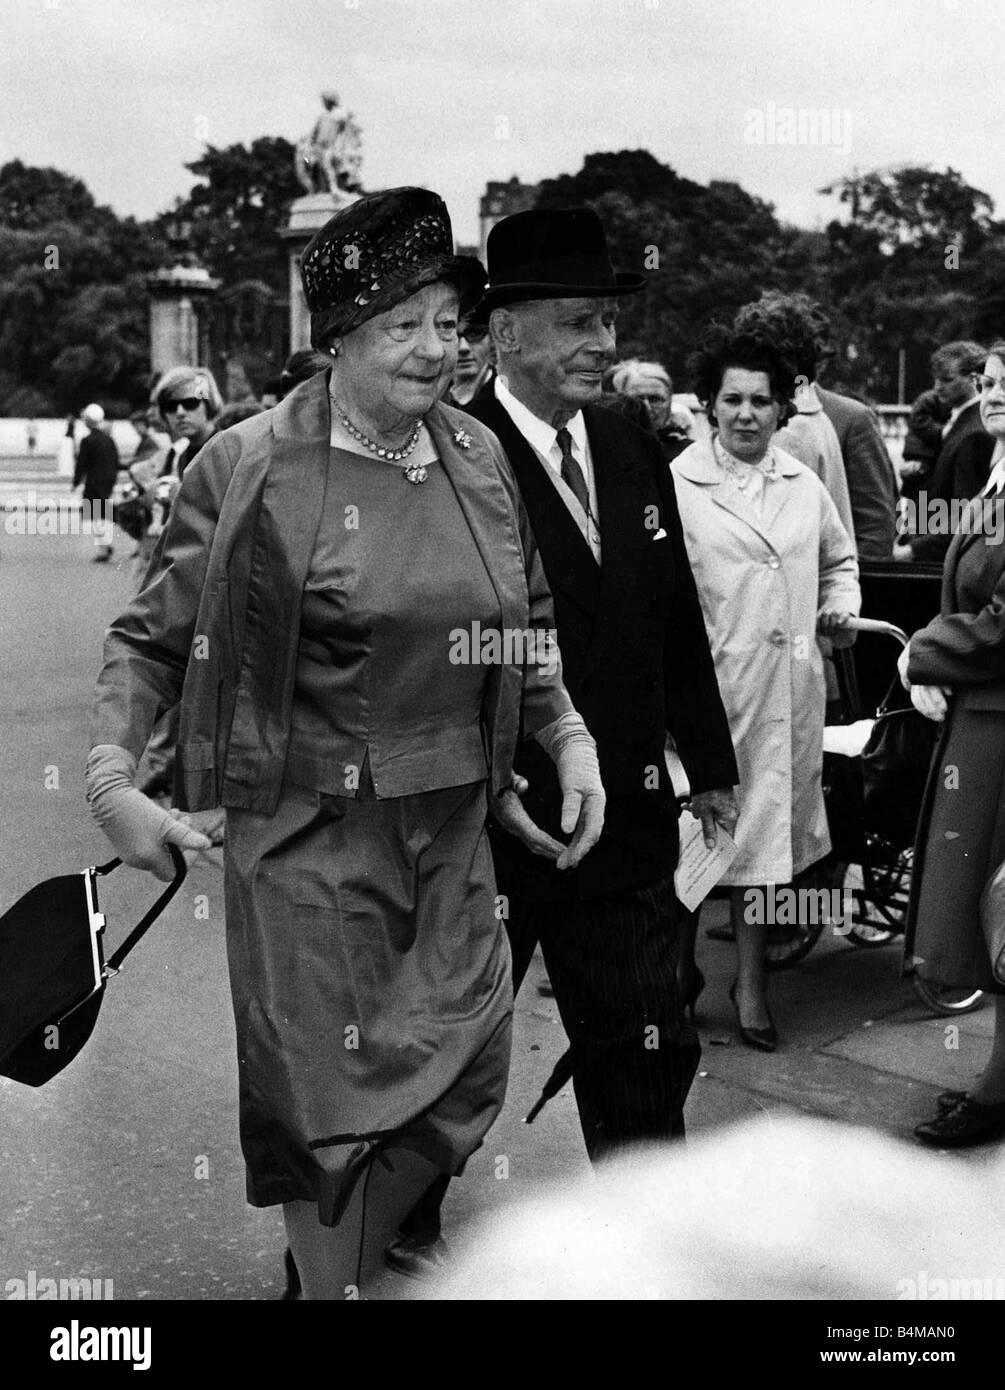 Athen Seyler July 1964 actress and husband Nicholas Hannen at Buckingham Palace garden Party Stock Photo